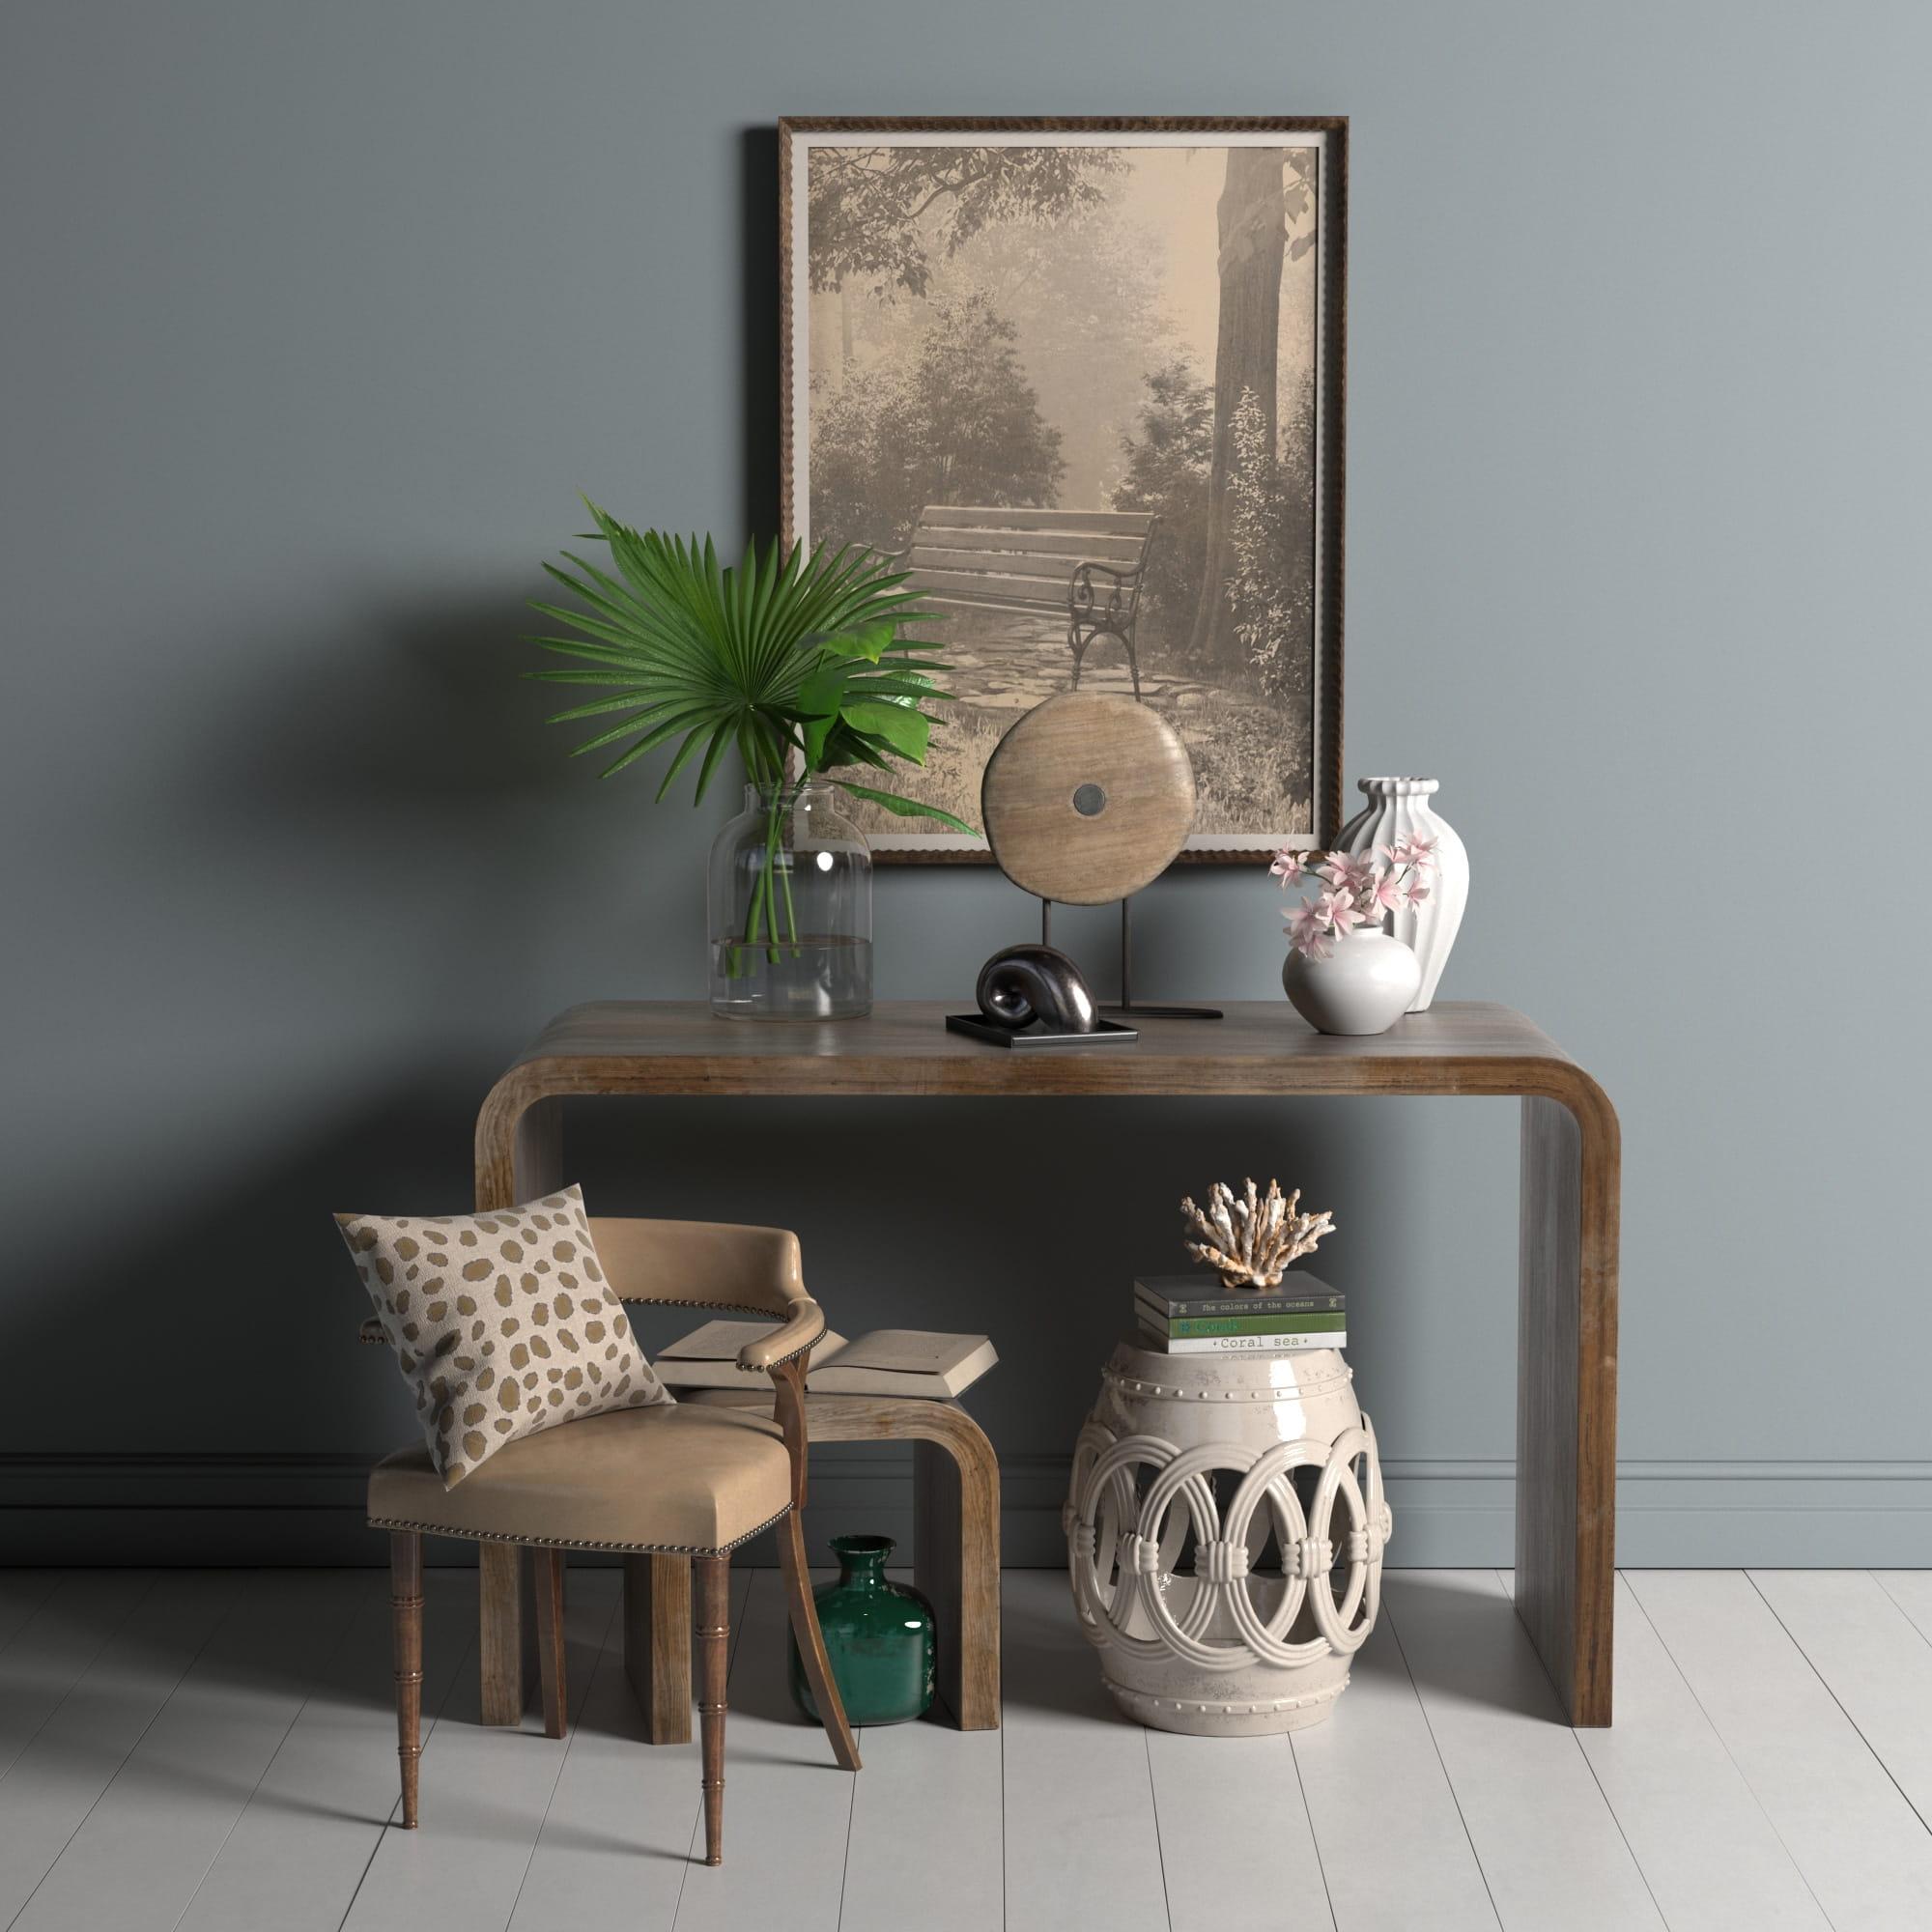 furniture set 25 AM225